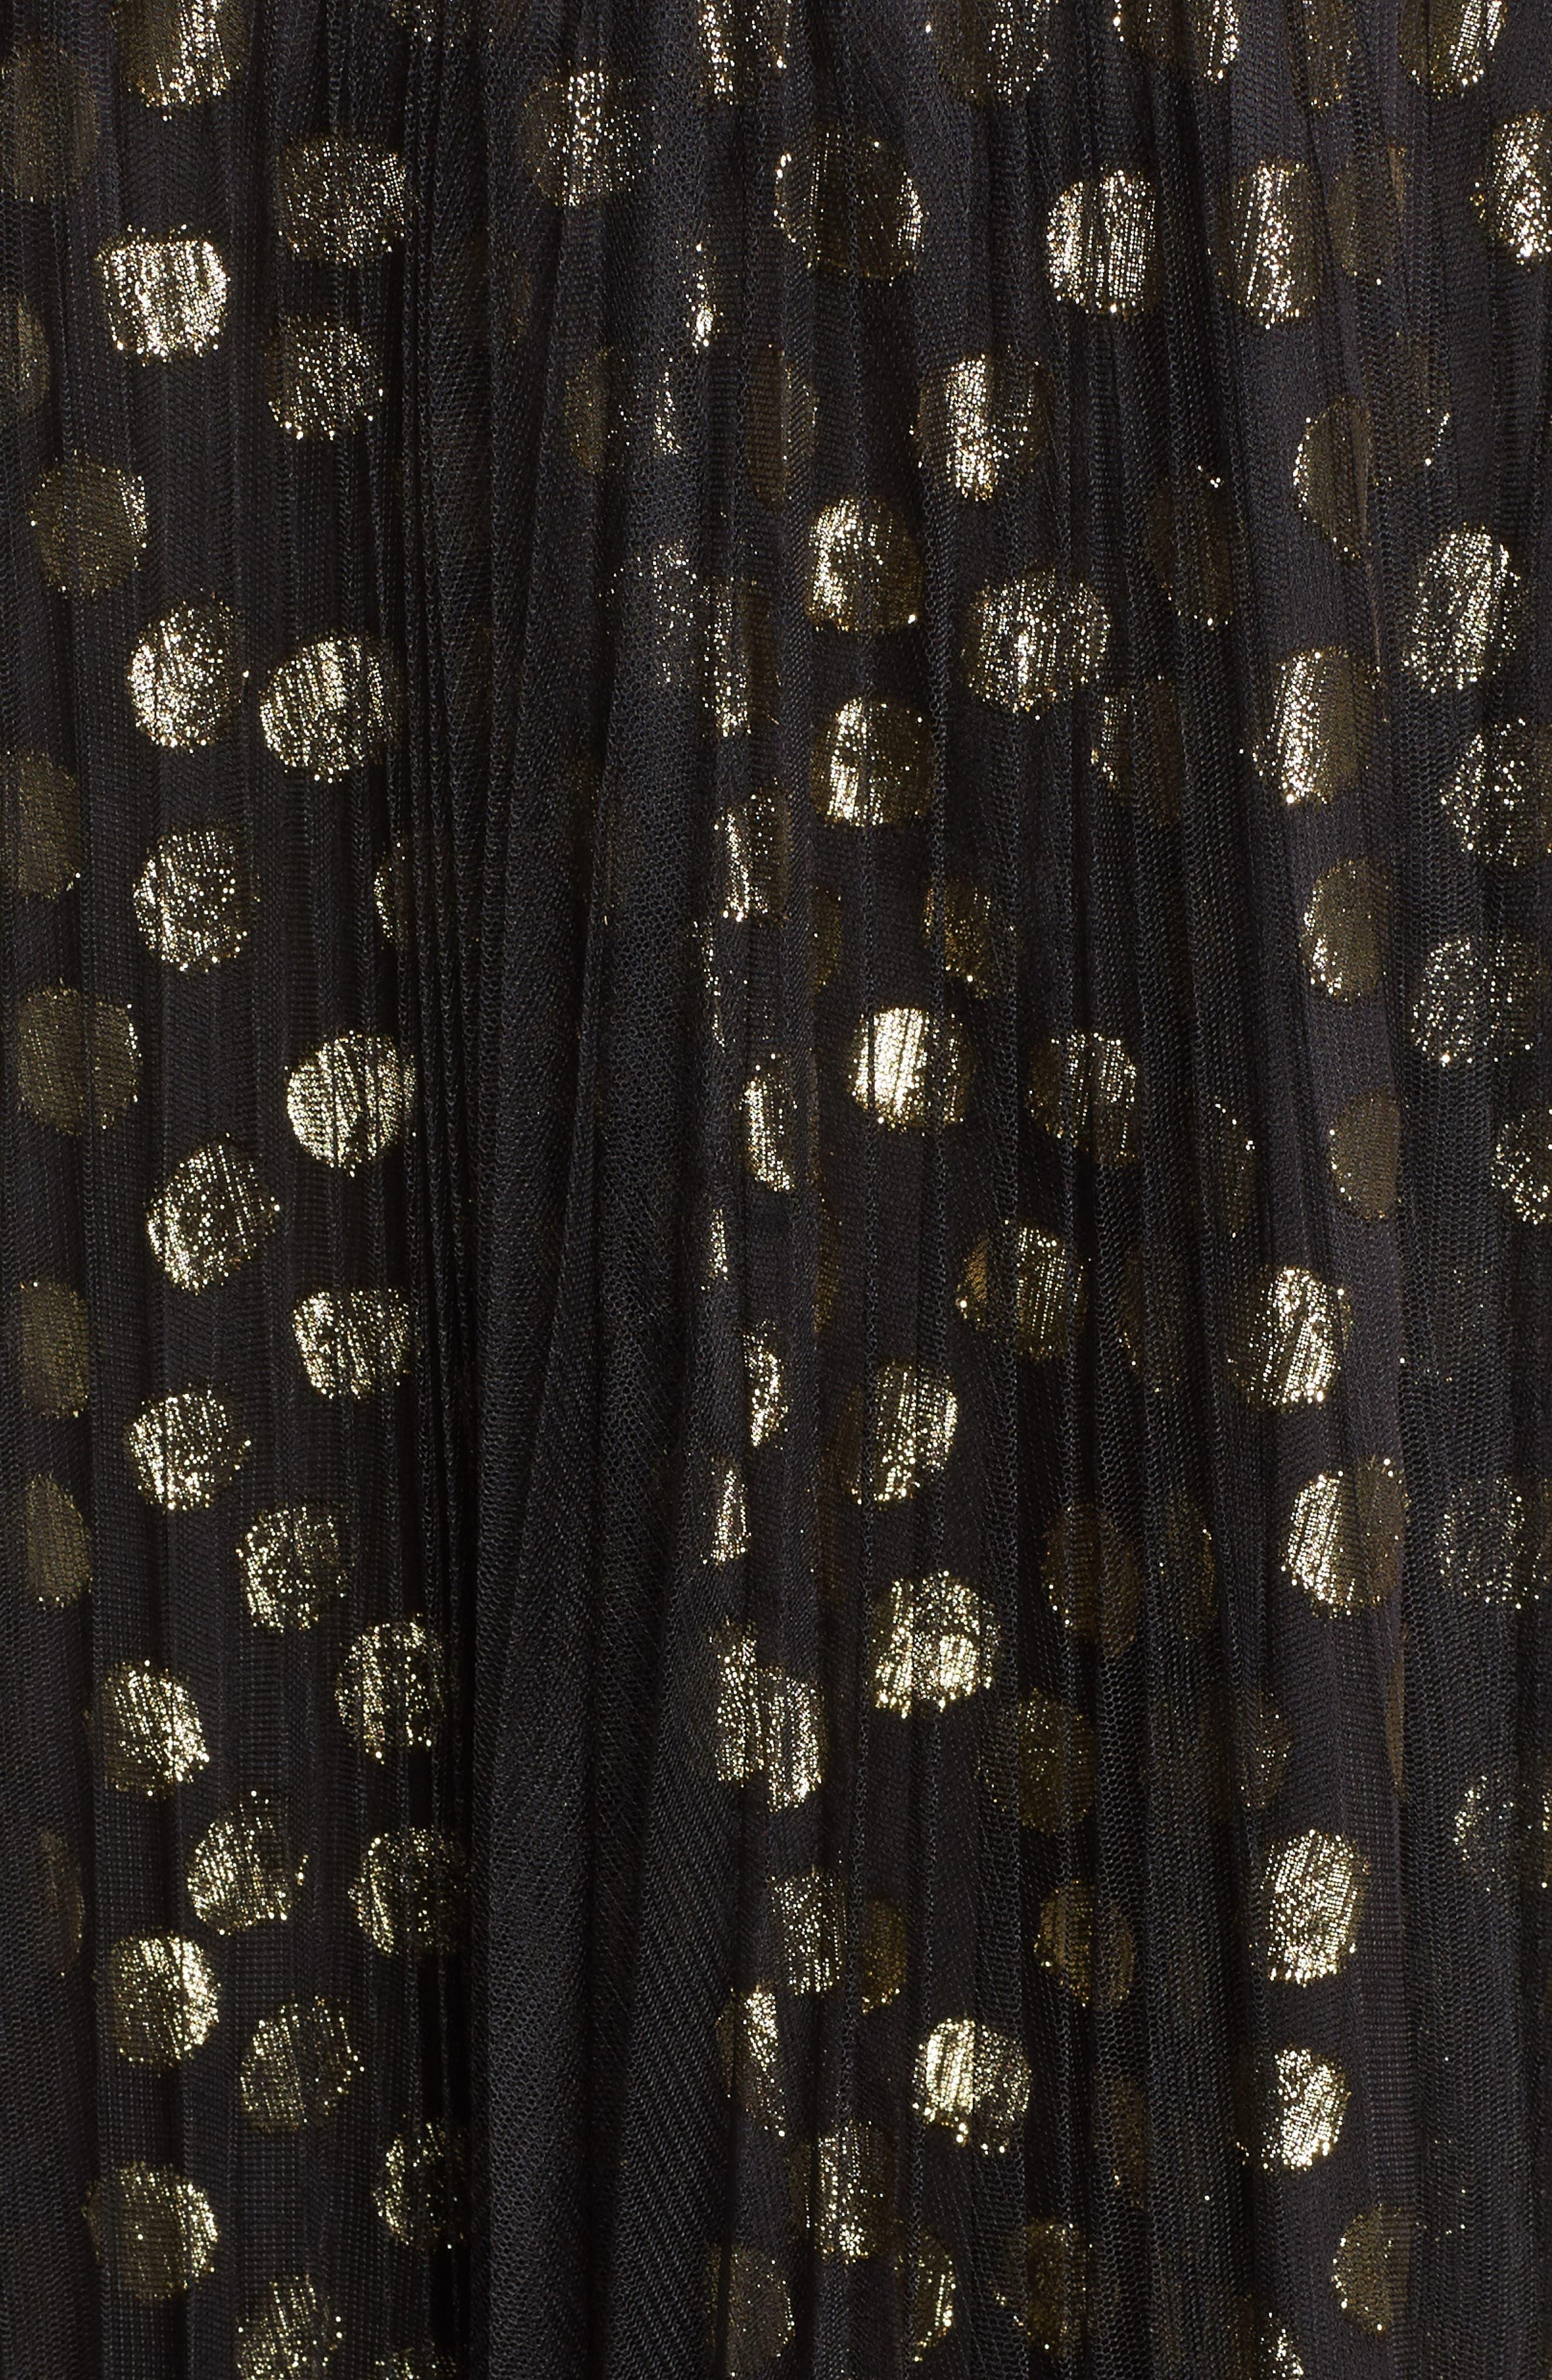 Shirred Metallic Dress,                             Alternate thumbnail 5, color,                             001